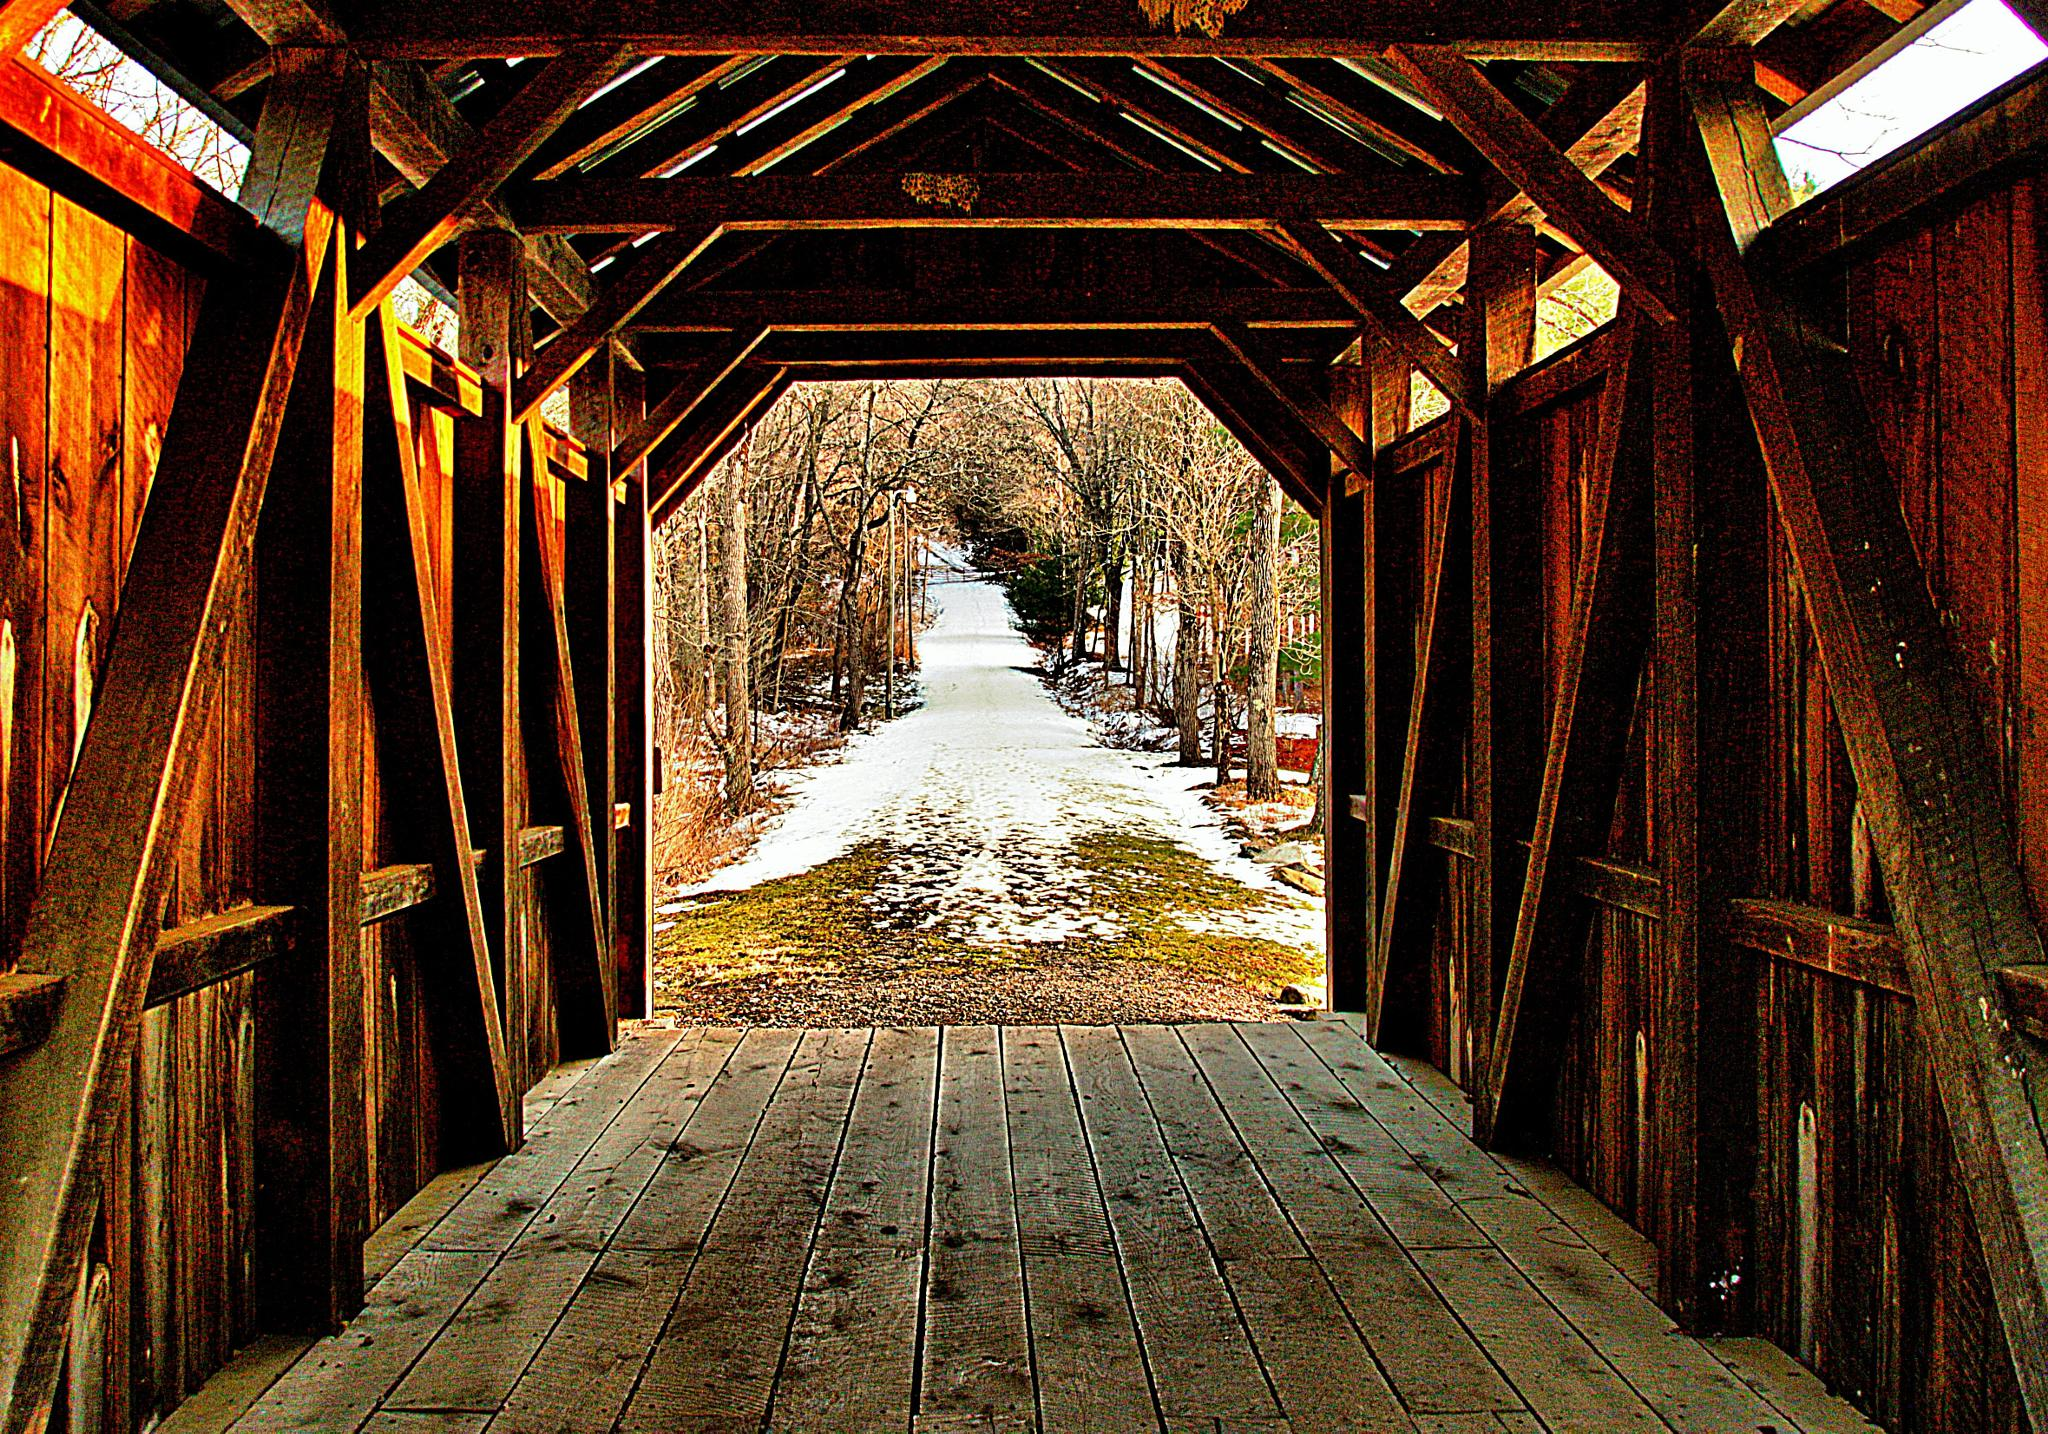 Bridge to everywhere by pennieawhite